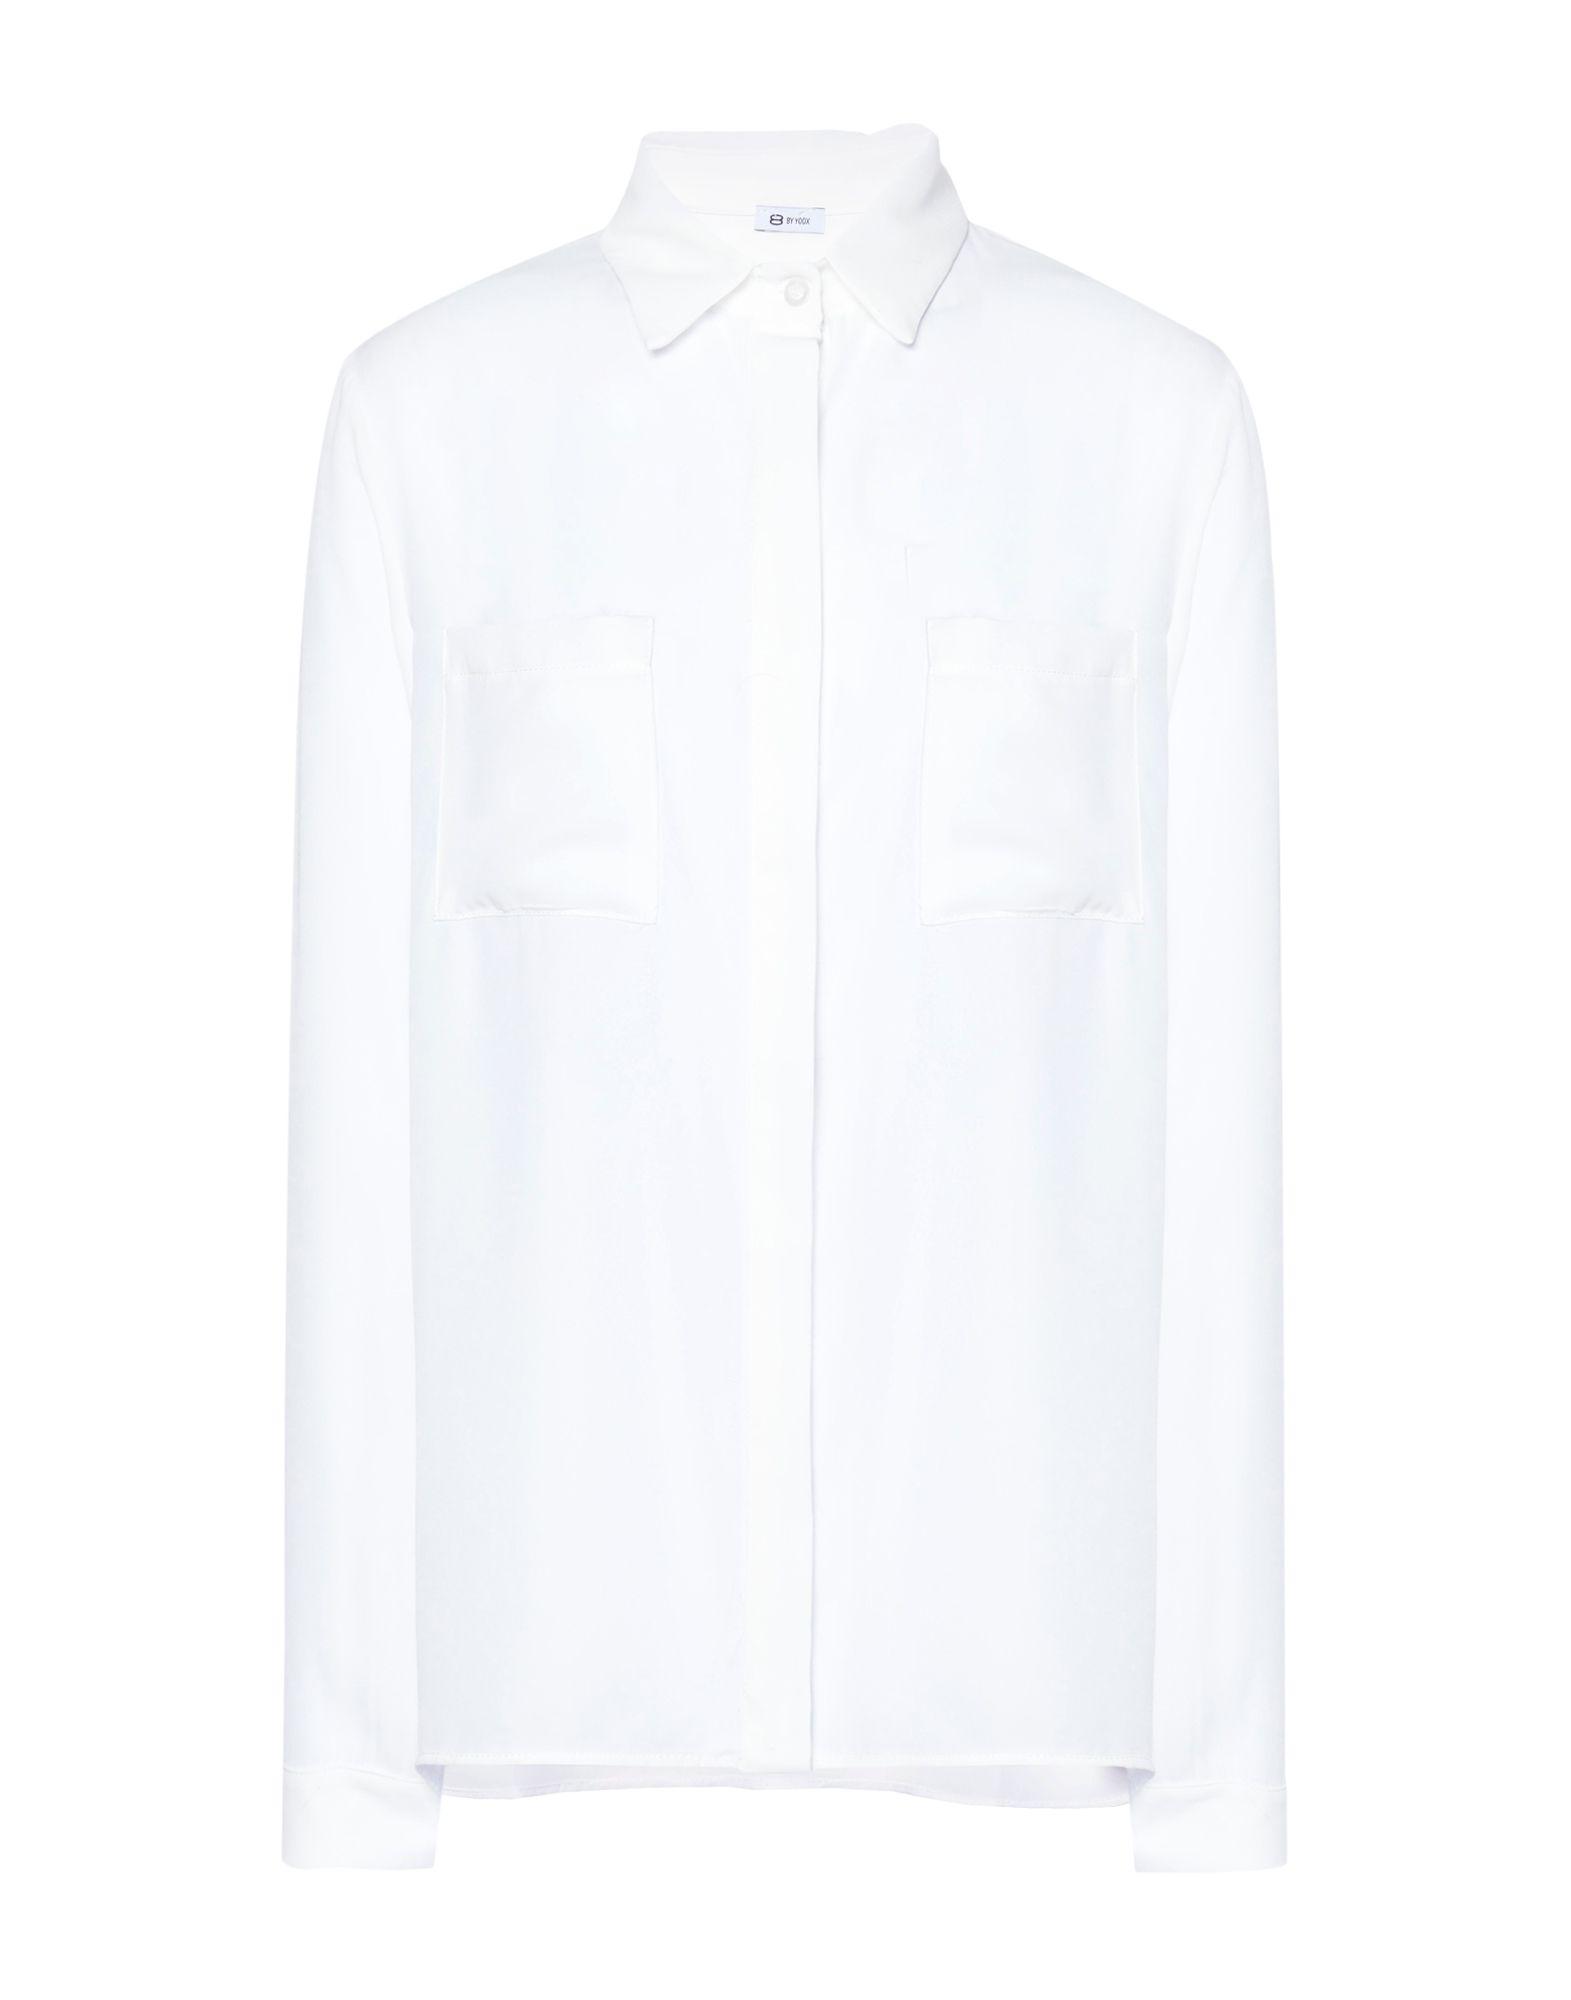 8 by YOOX Pубашка женские блузки и рубашки new 2015 hbkstop